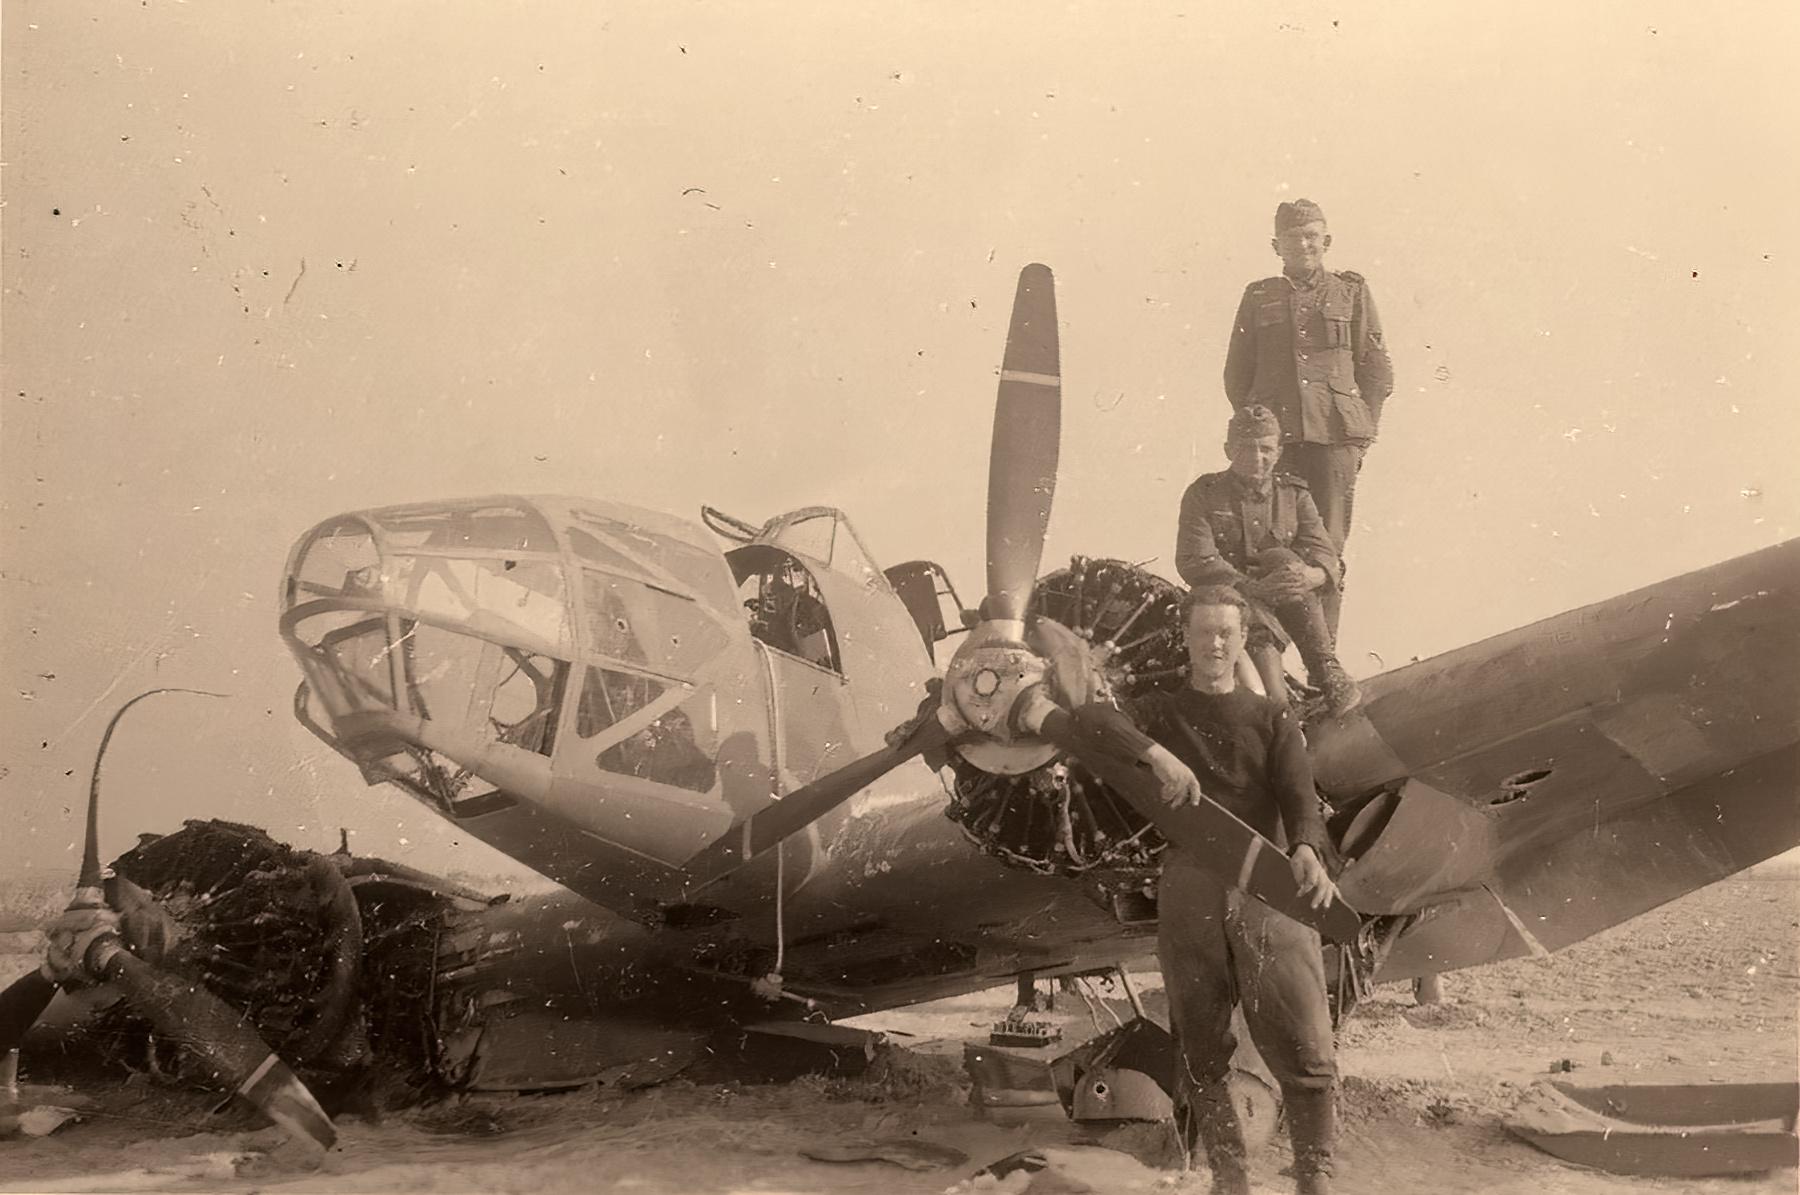 French Airforce Potez 63.11 captured battle of France 1940 ebay 01